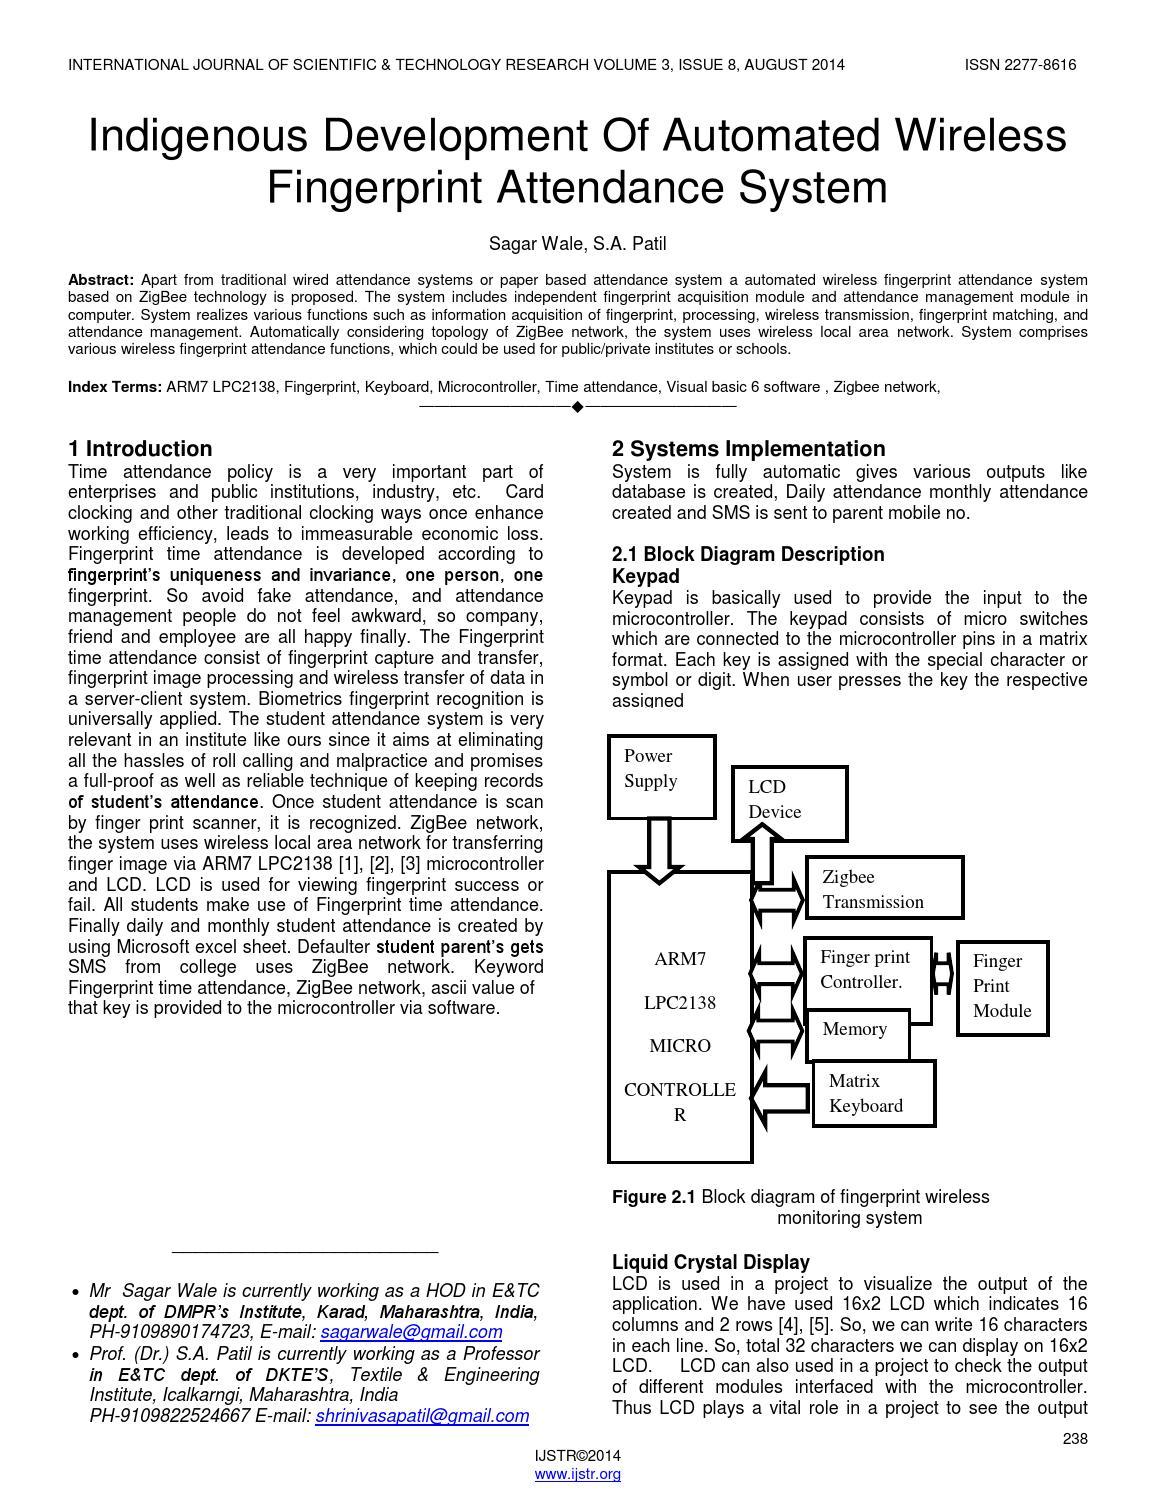 Indigenous development of automated wireless fingerprint attendance system